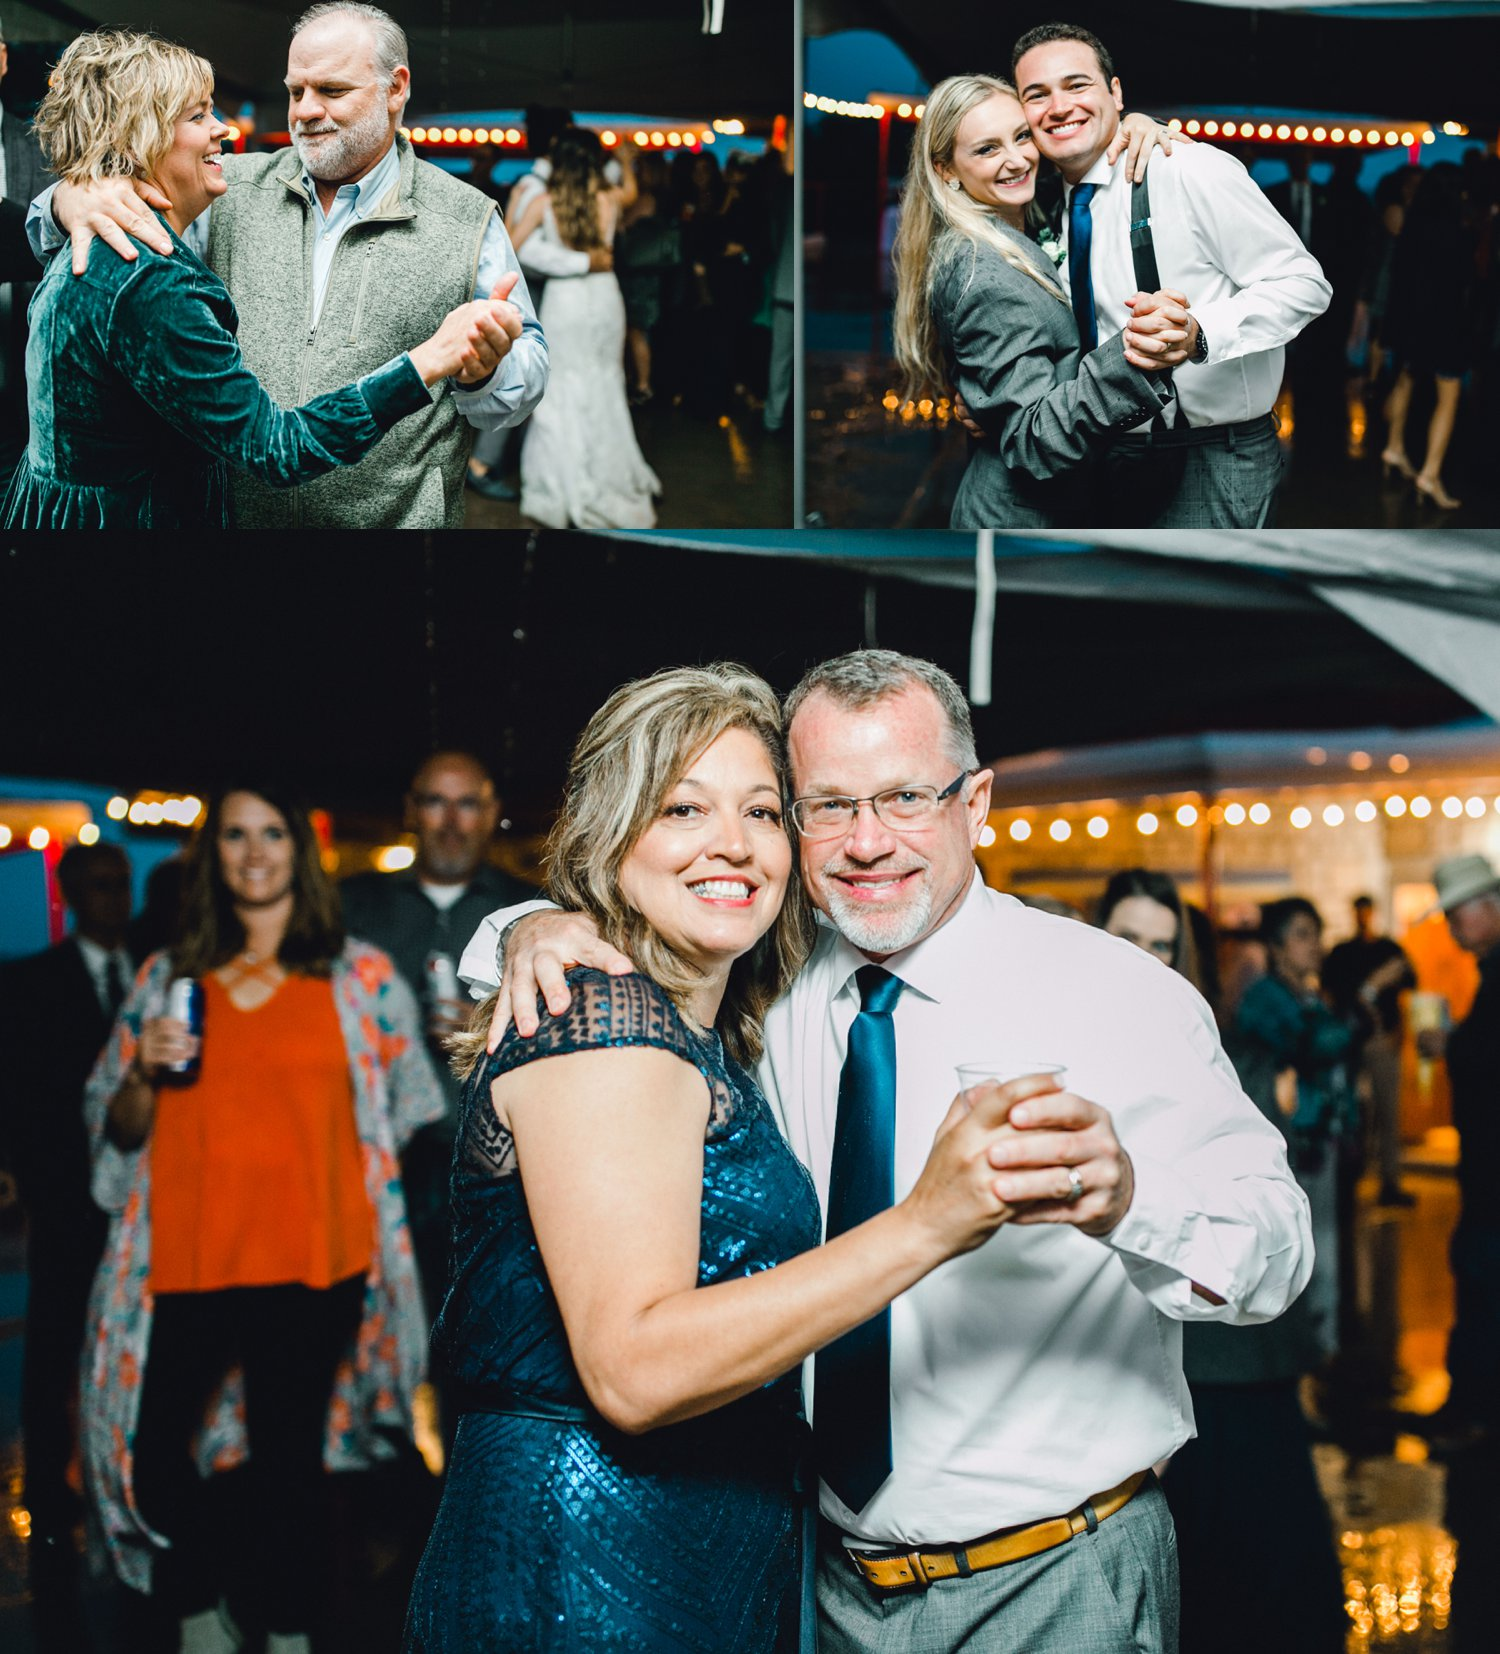 Ashley_John_English_Elegant_Texas_Wedding_Outdoors_Ranch_Caprock_Winery_ALLEEJ_0205.jpg